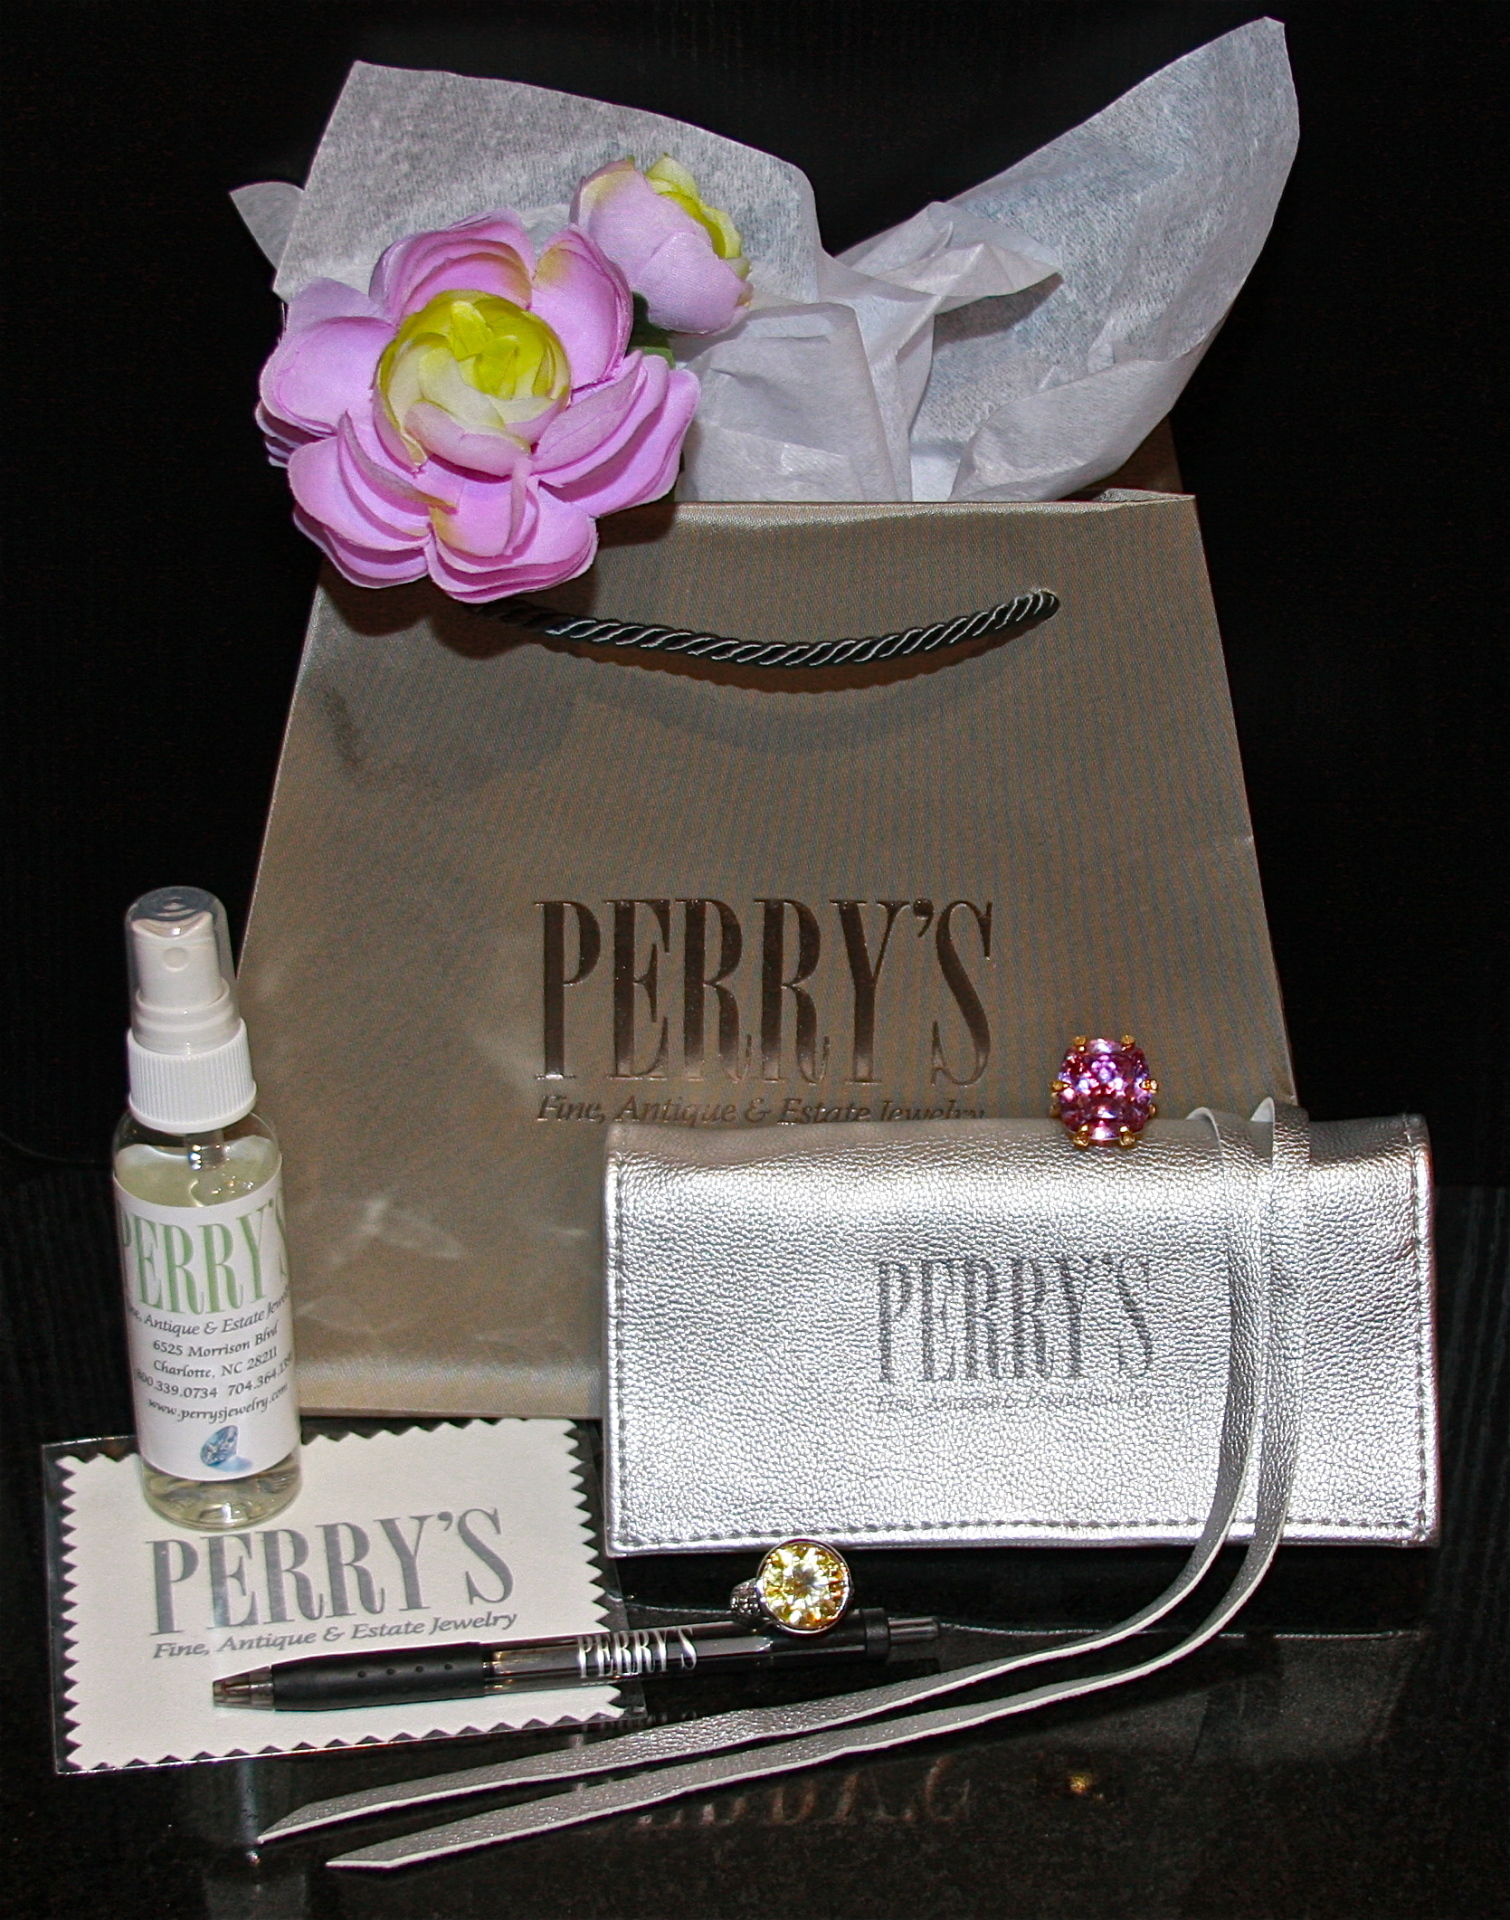 Perry's fine jewelry